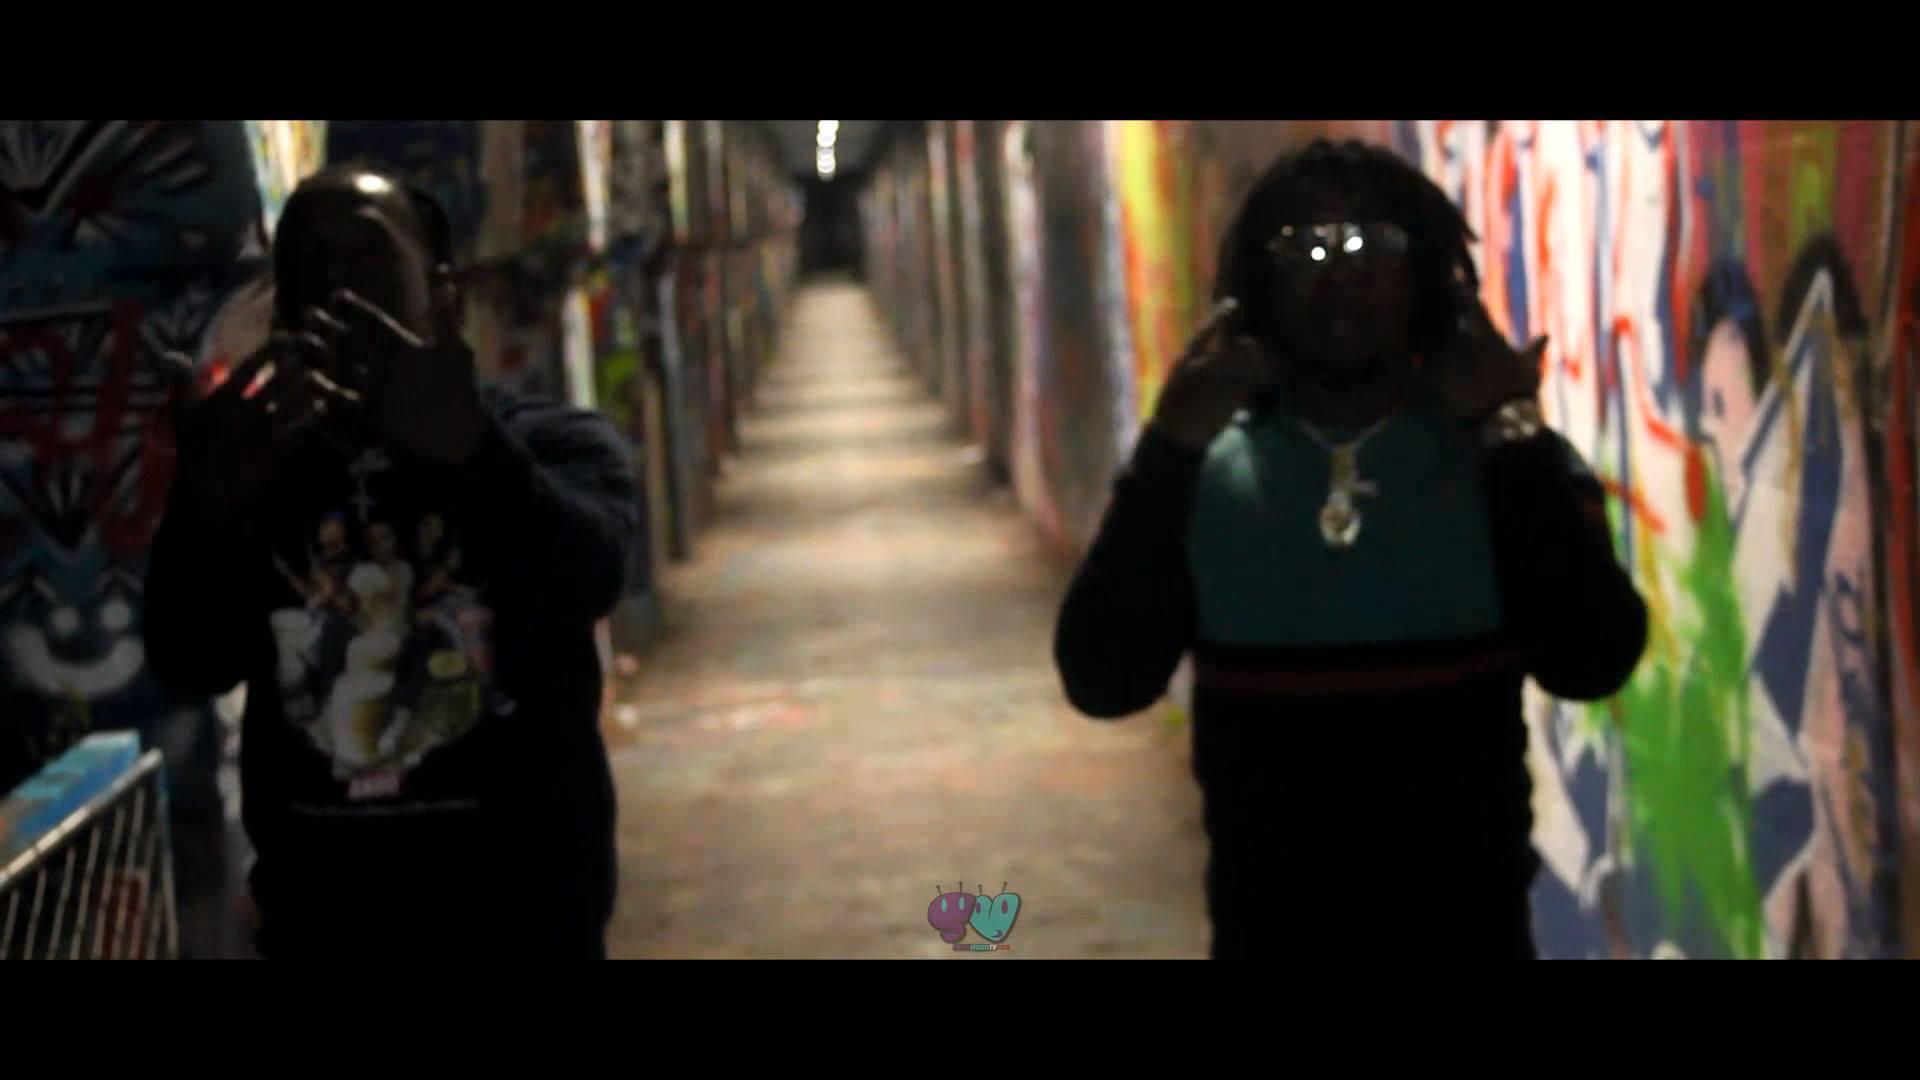 MAJIK ZOE x HICKSBOI4REAL - TOP (MUSIC VIDEO)